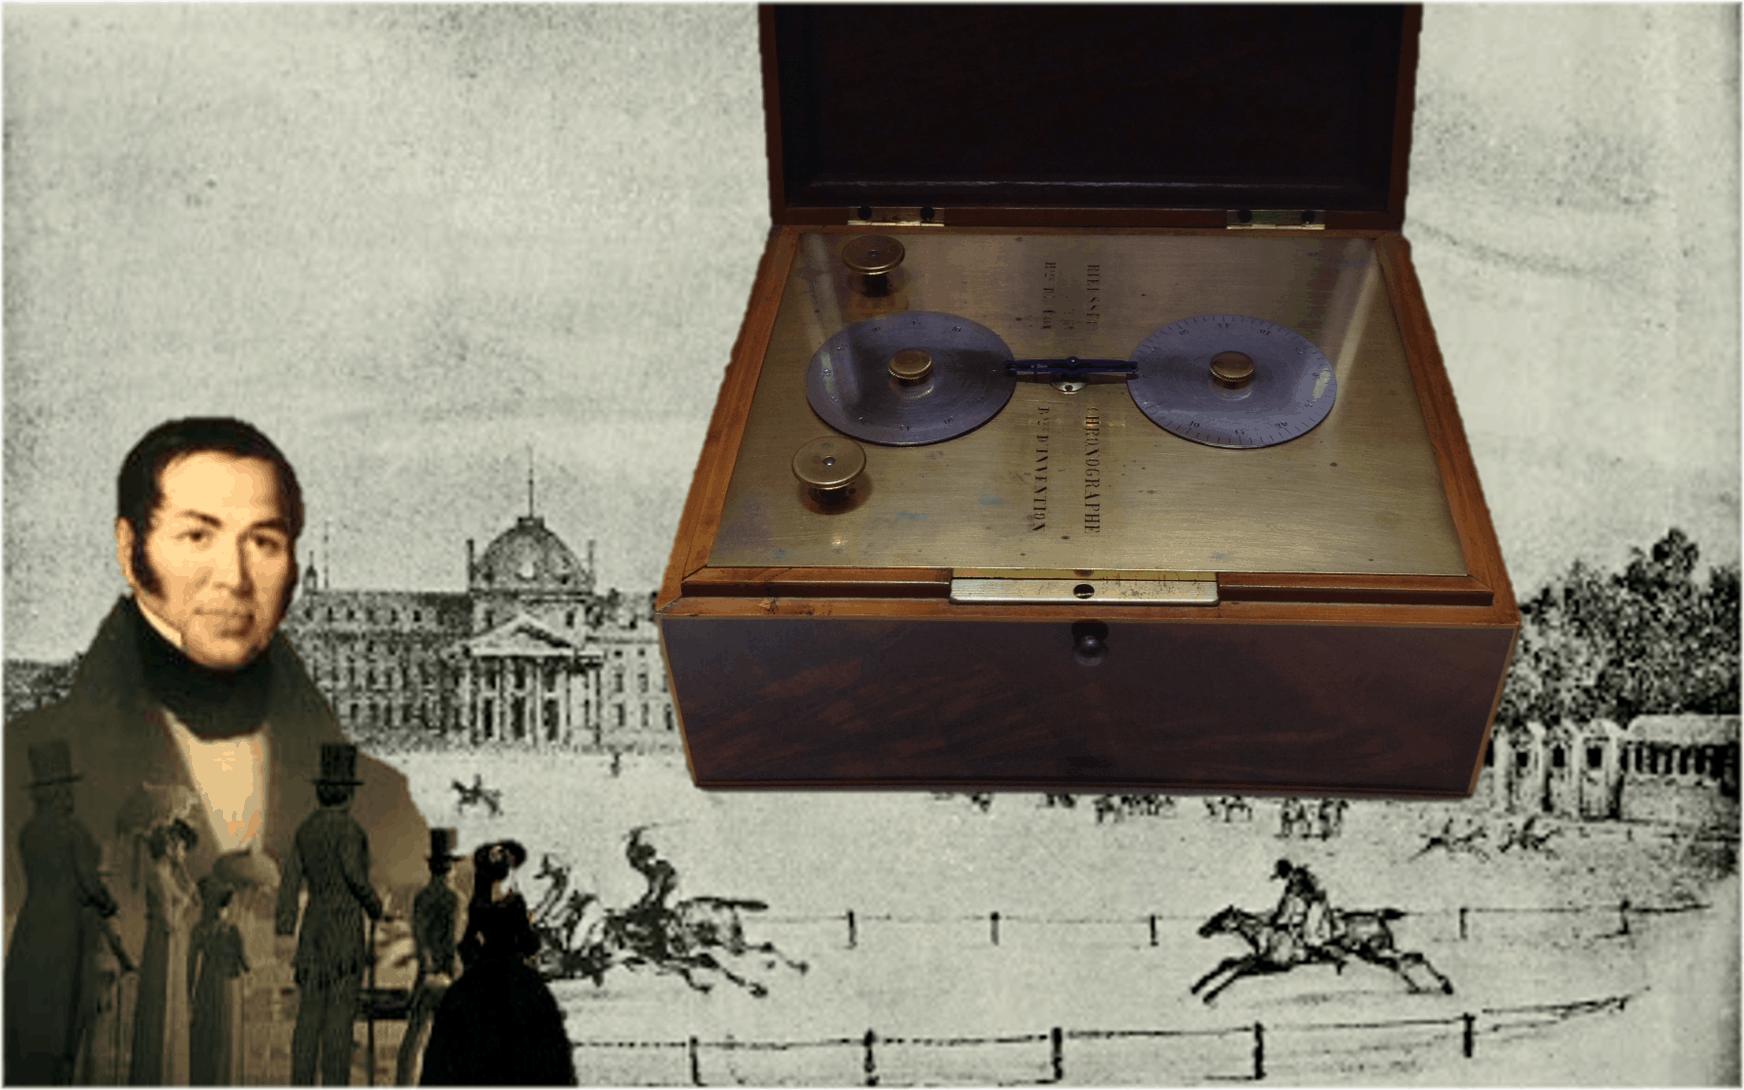 Tinten-Chronograph von Nicolas Mathieu Rieussec aus dem Jahr 1821